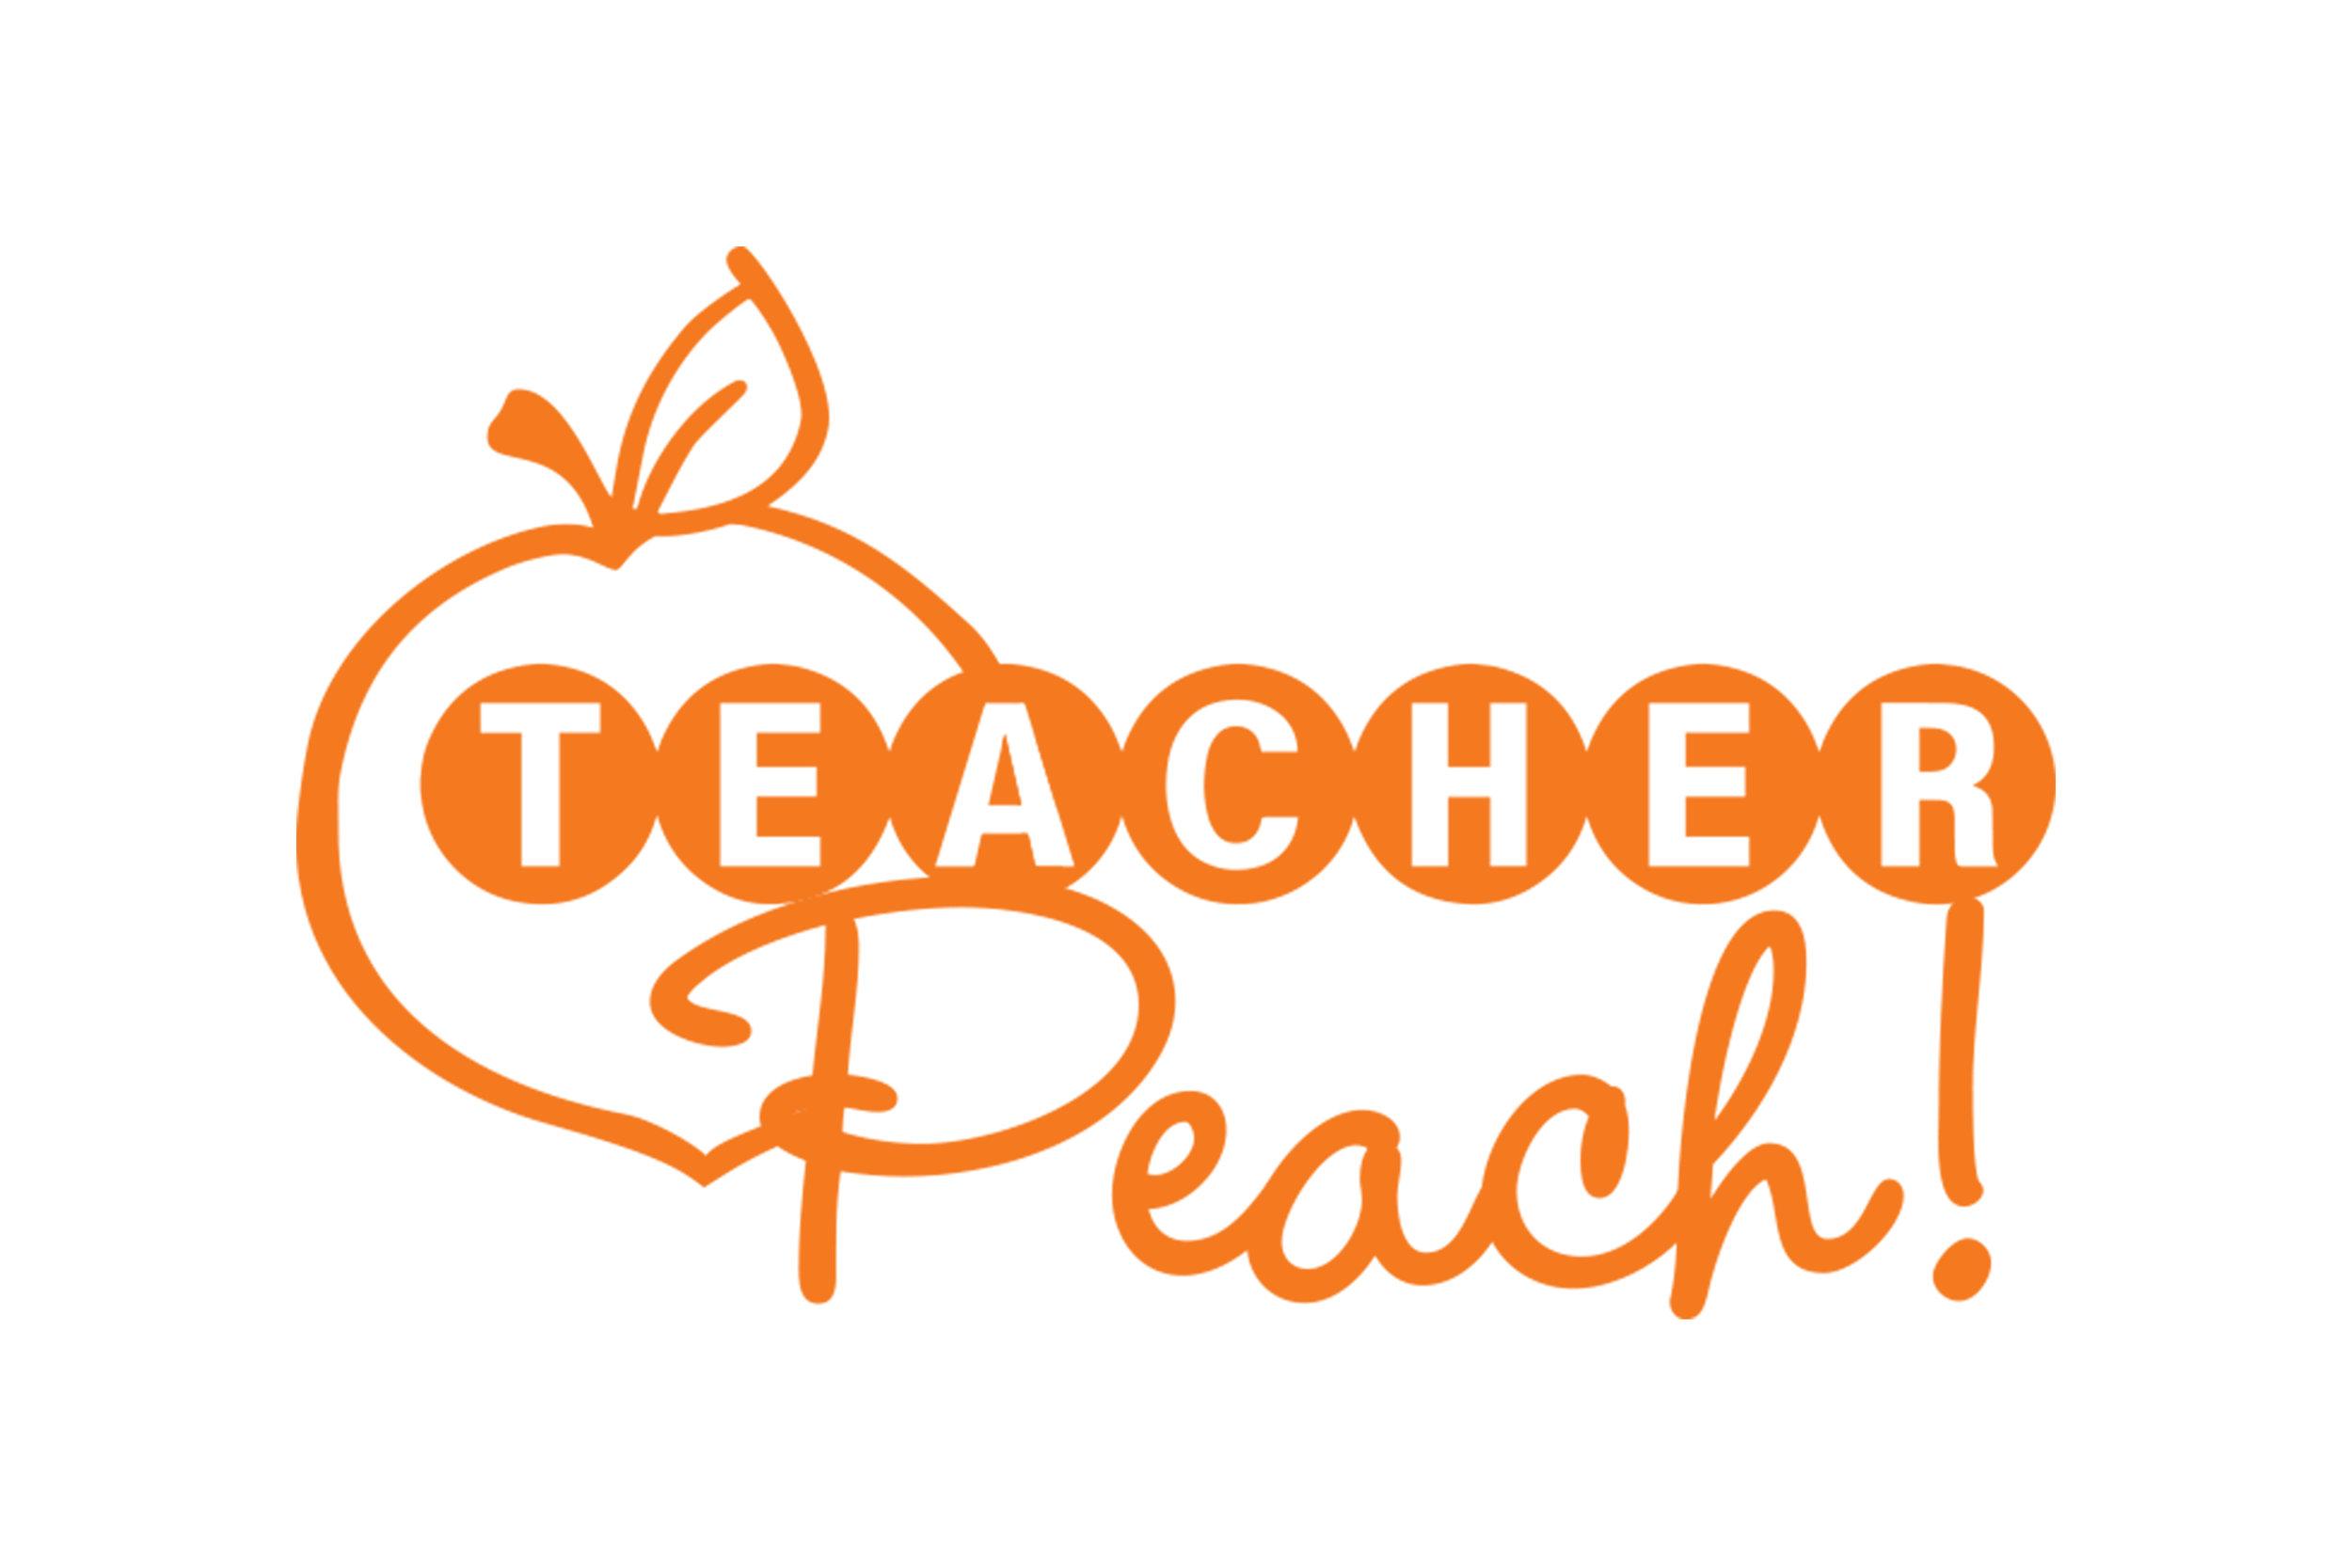 Portfolio_TeacherPeach_8.jpg